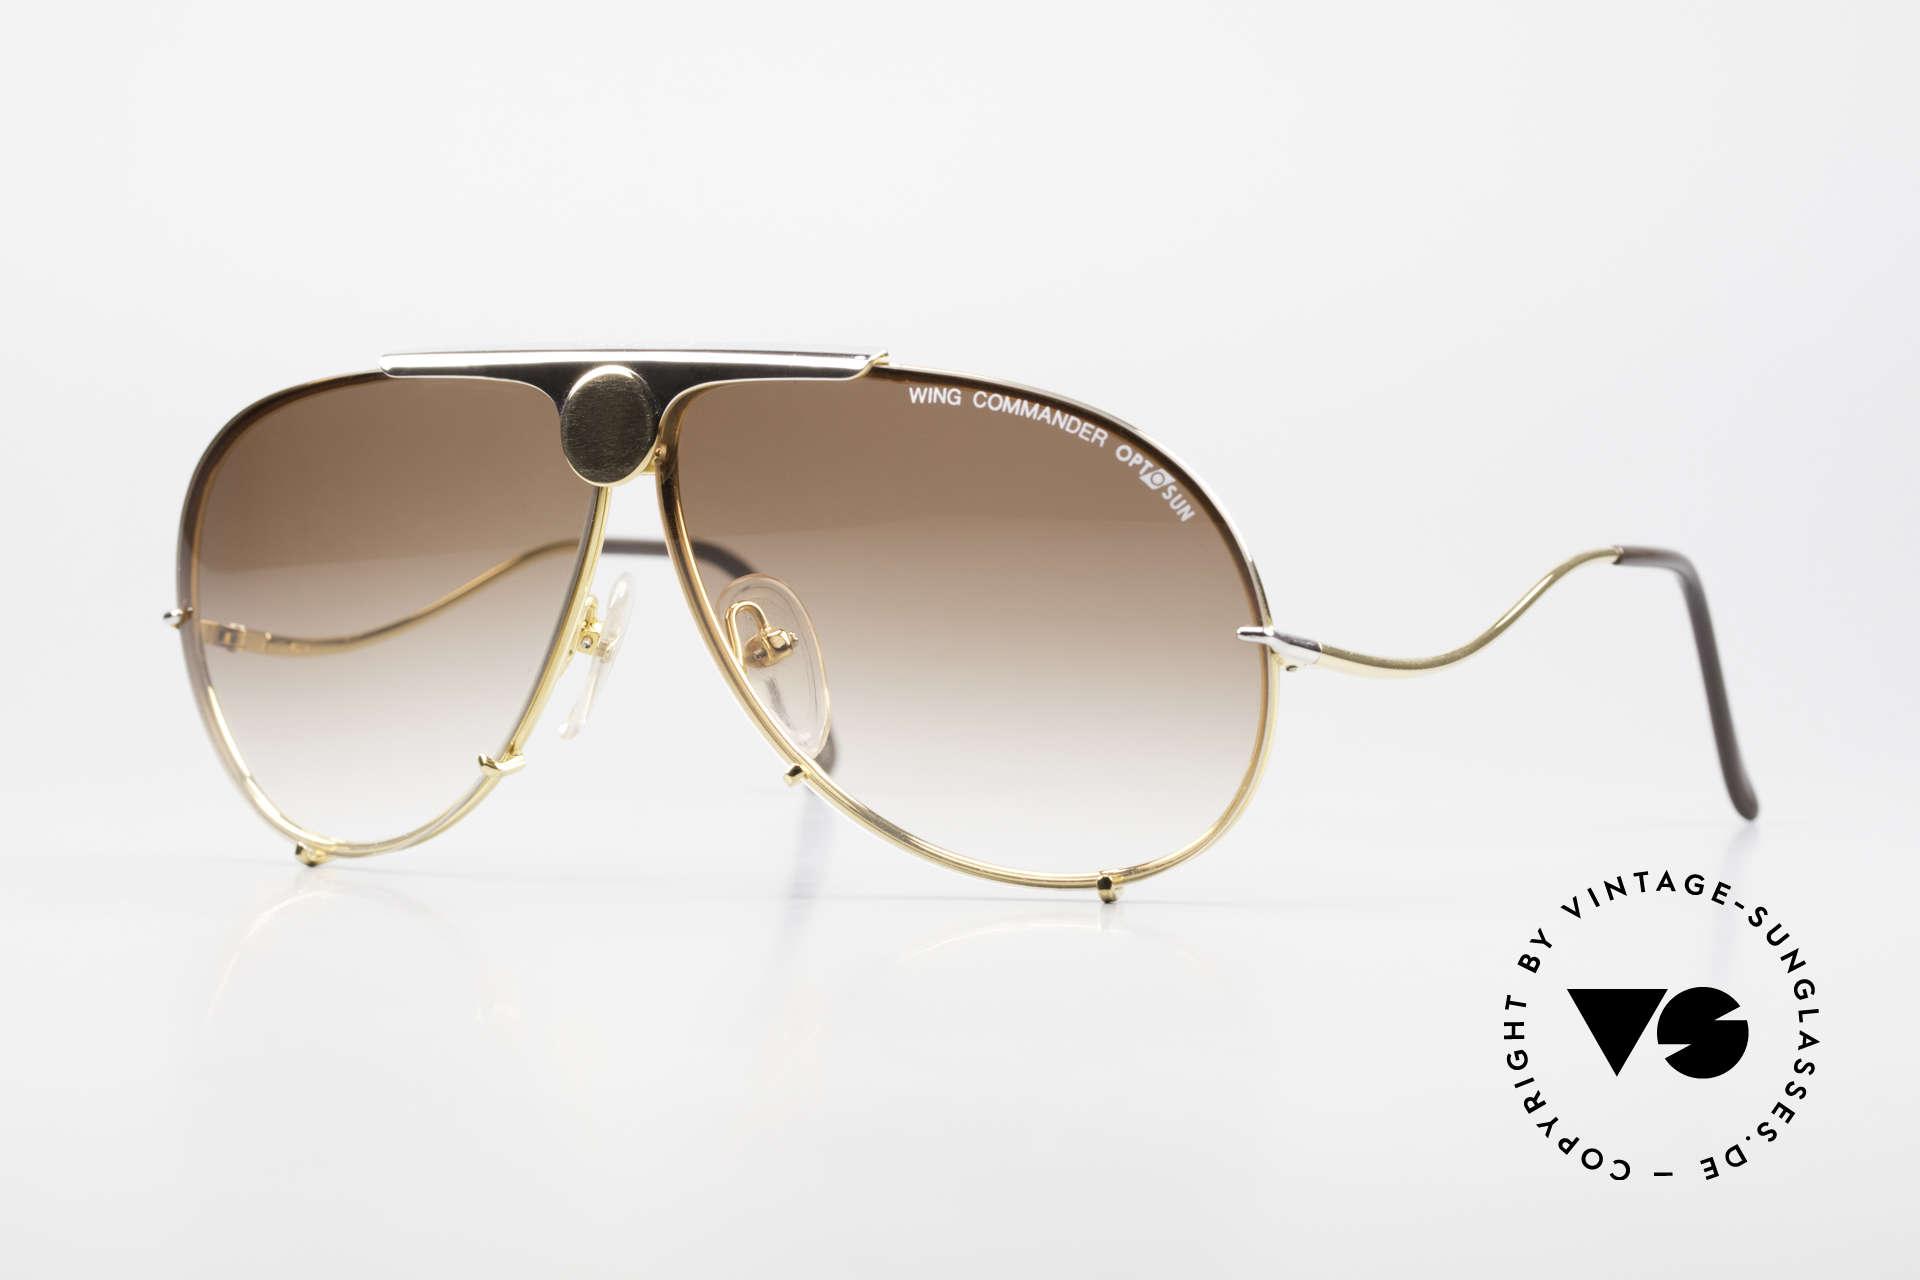 Colani 10-401 Optos Design Wing Commander, extravagant 80's designer shades by Luigi Colani, Made for Men